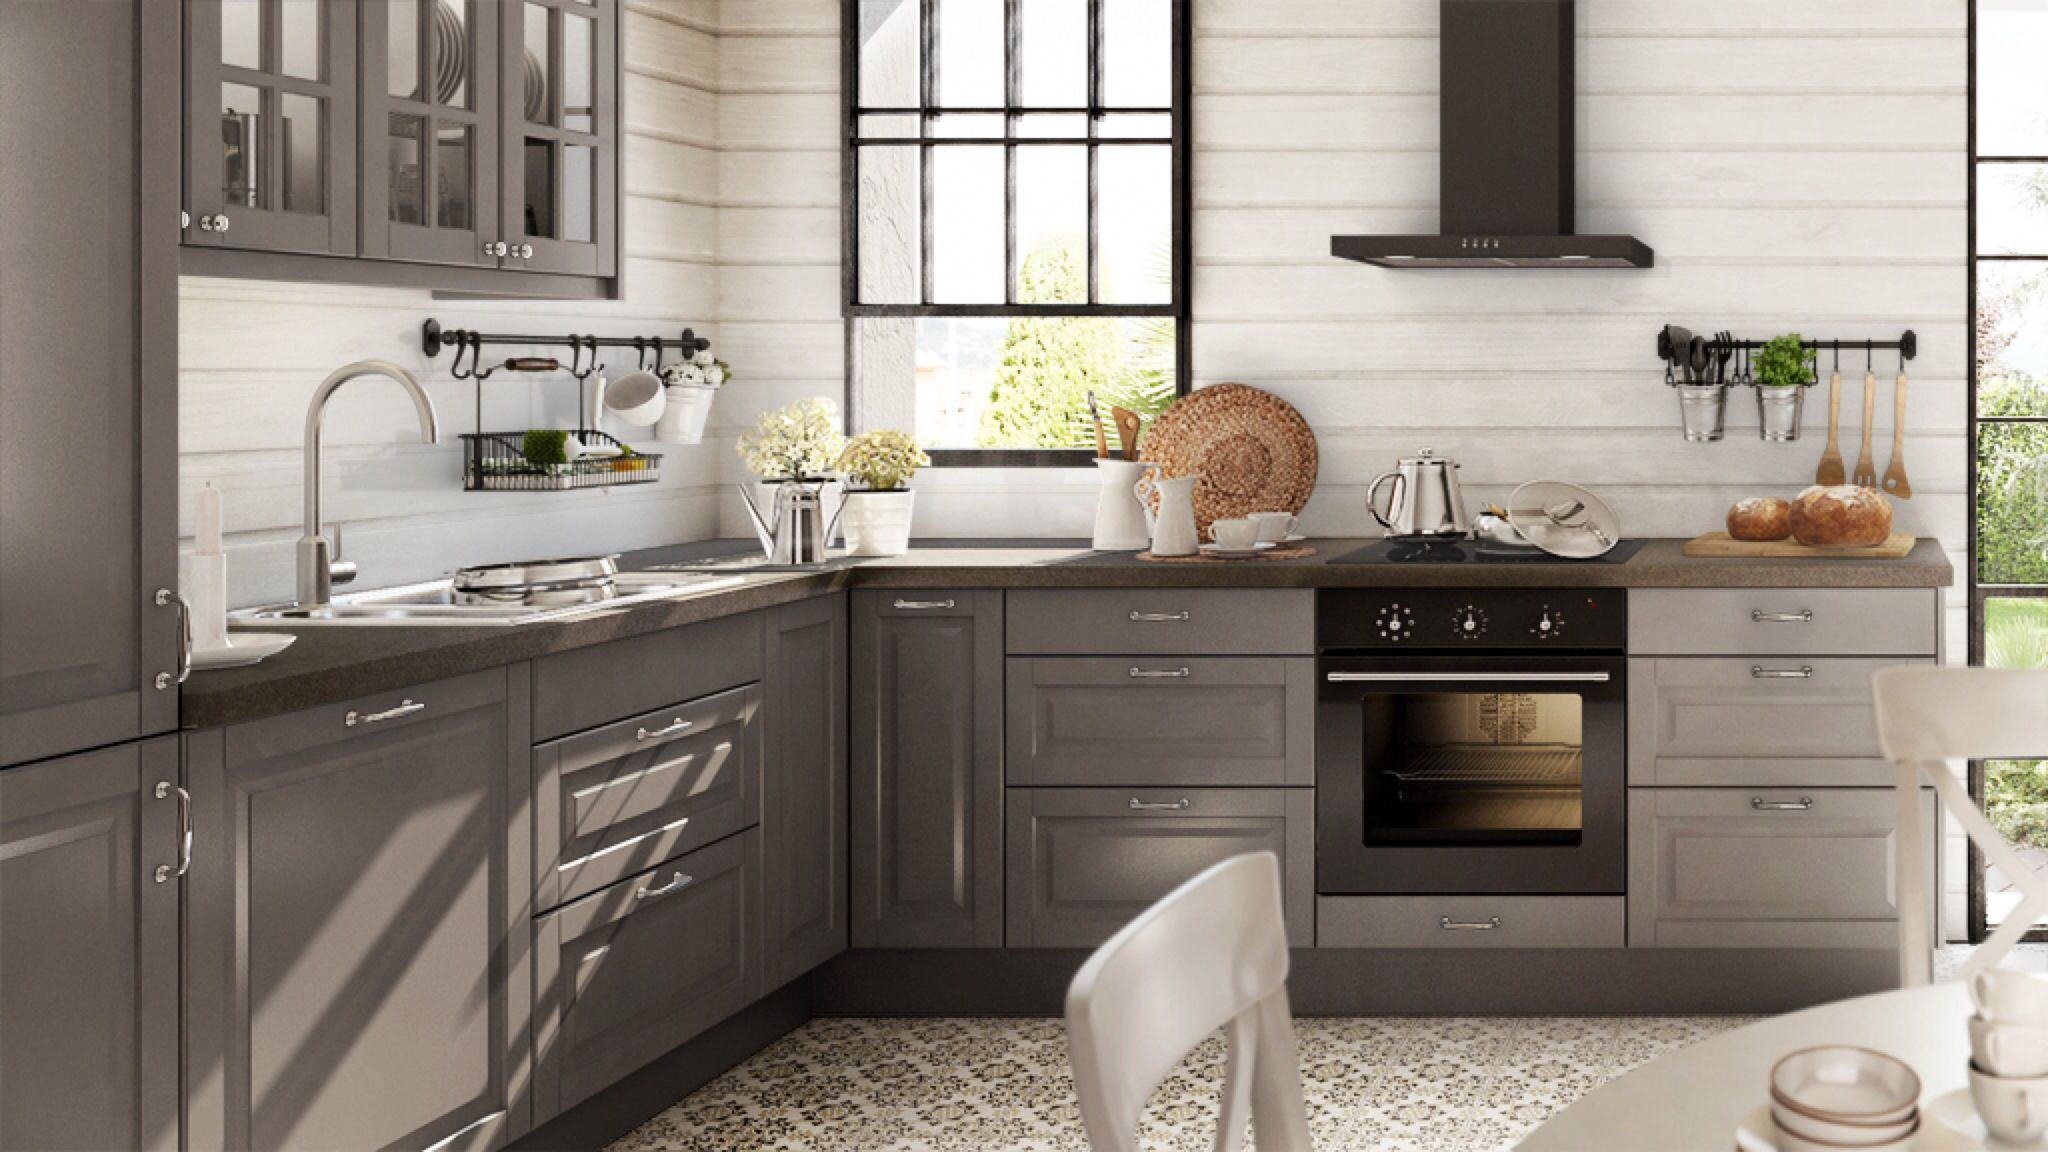 Ikea 3d keukenplanner verbouwen pinterest for Beste 3d keukenplanner